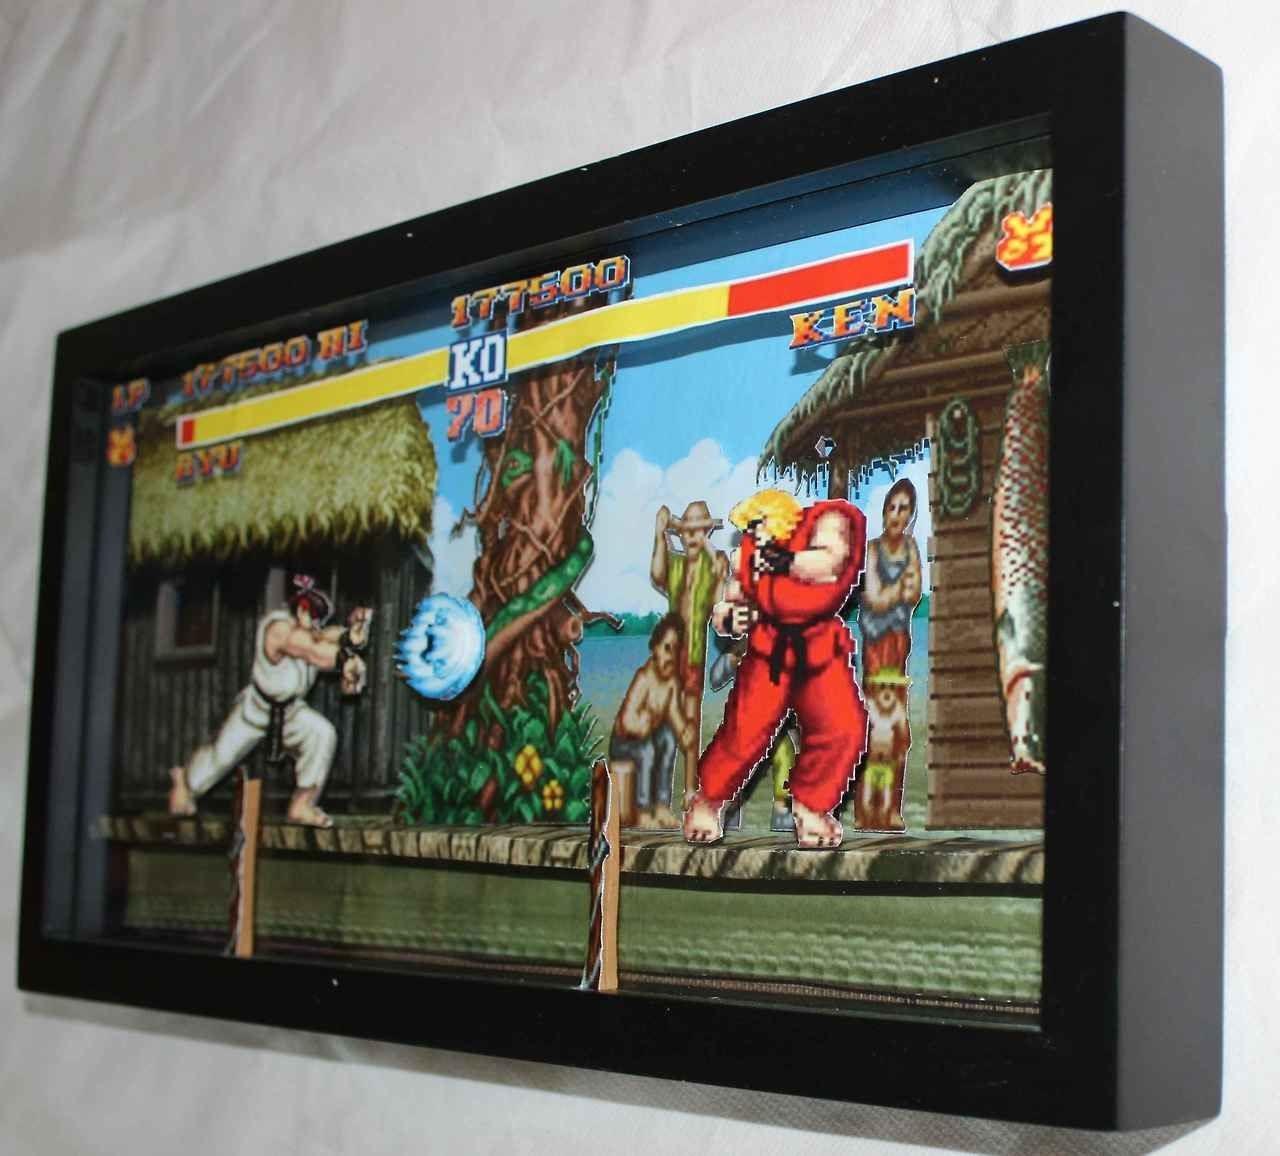 Papercraft Arcade Classic Nes Games In 3d Paper Dioramas